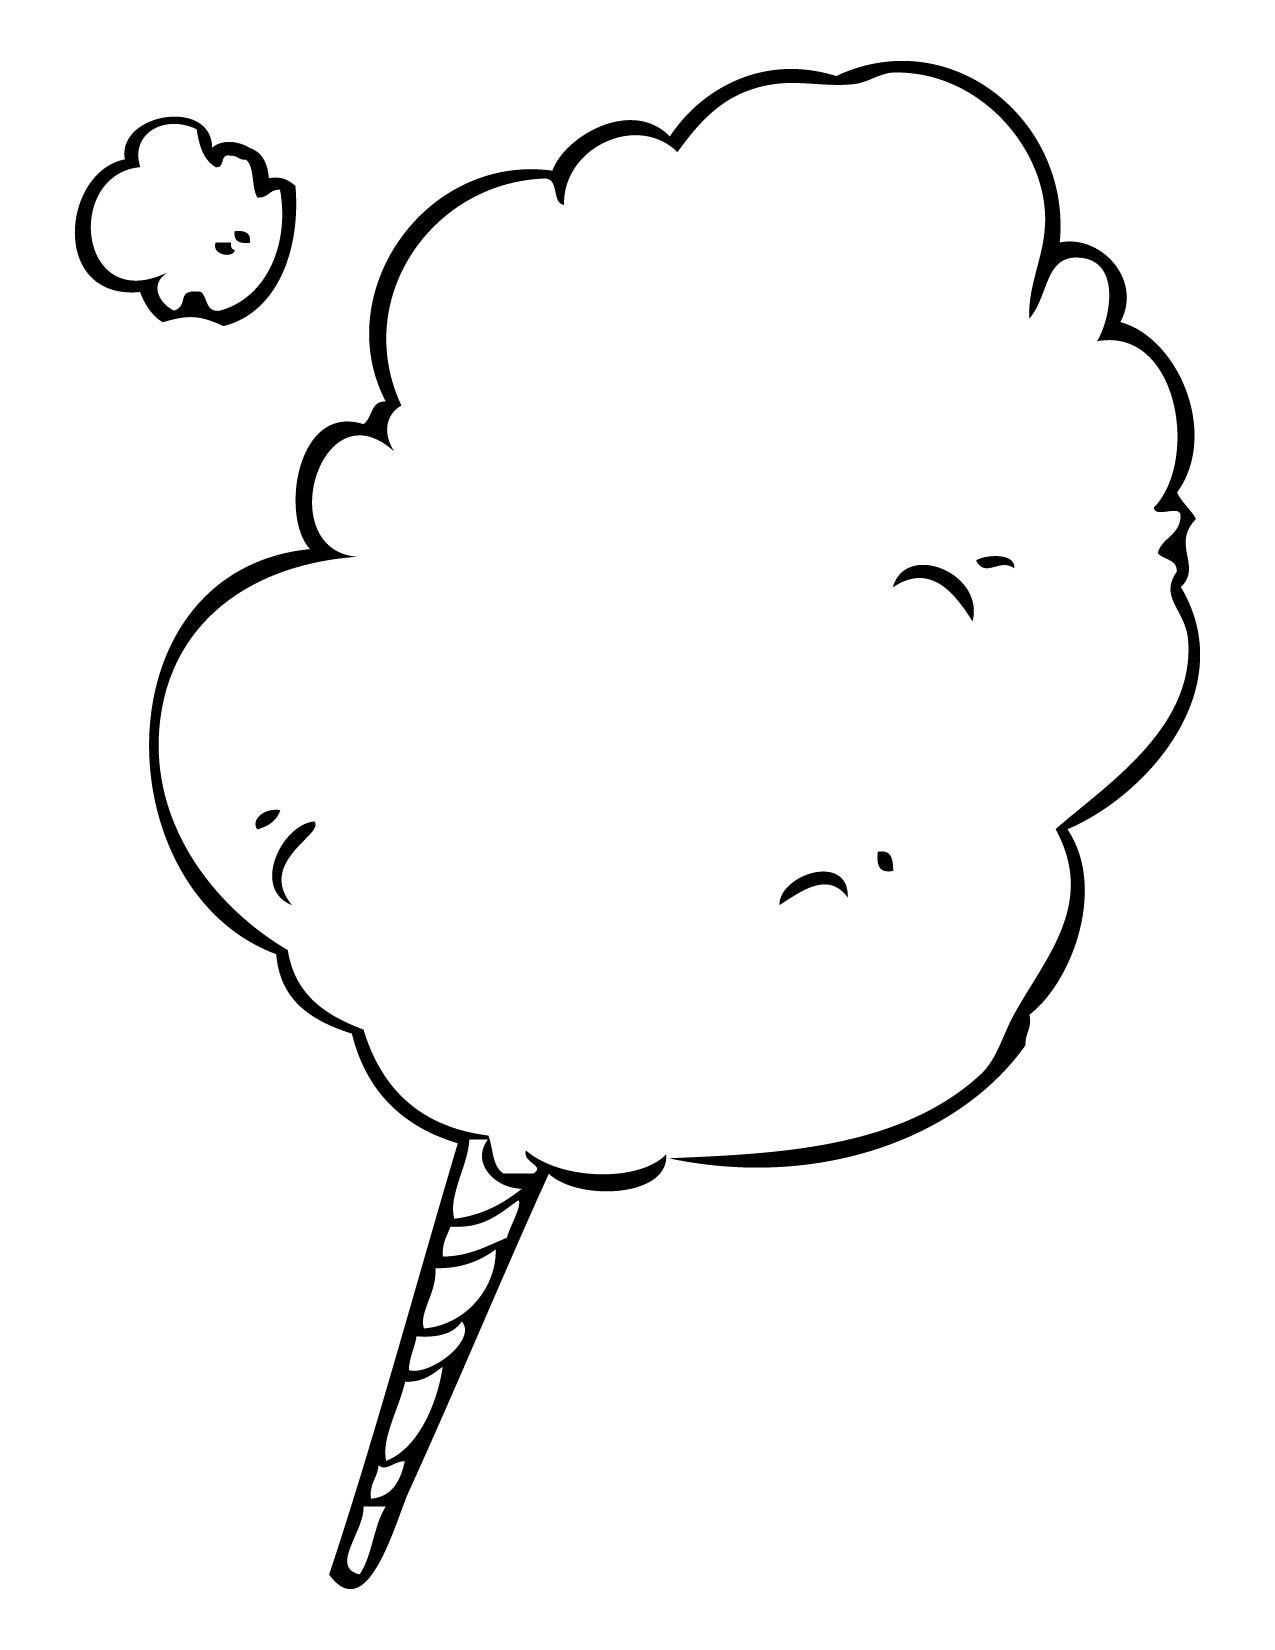 Cotton Candy | Circus | Pinterest